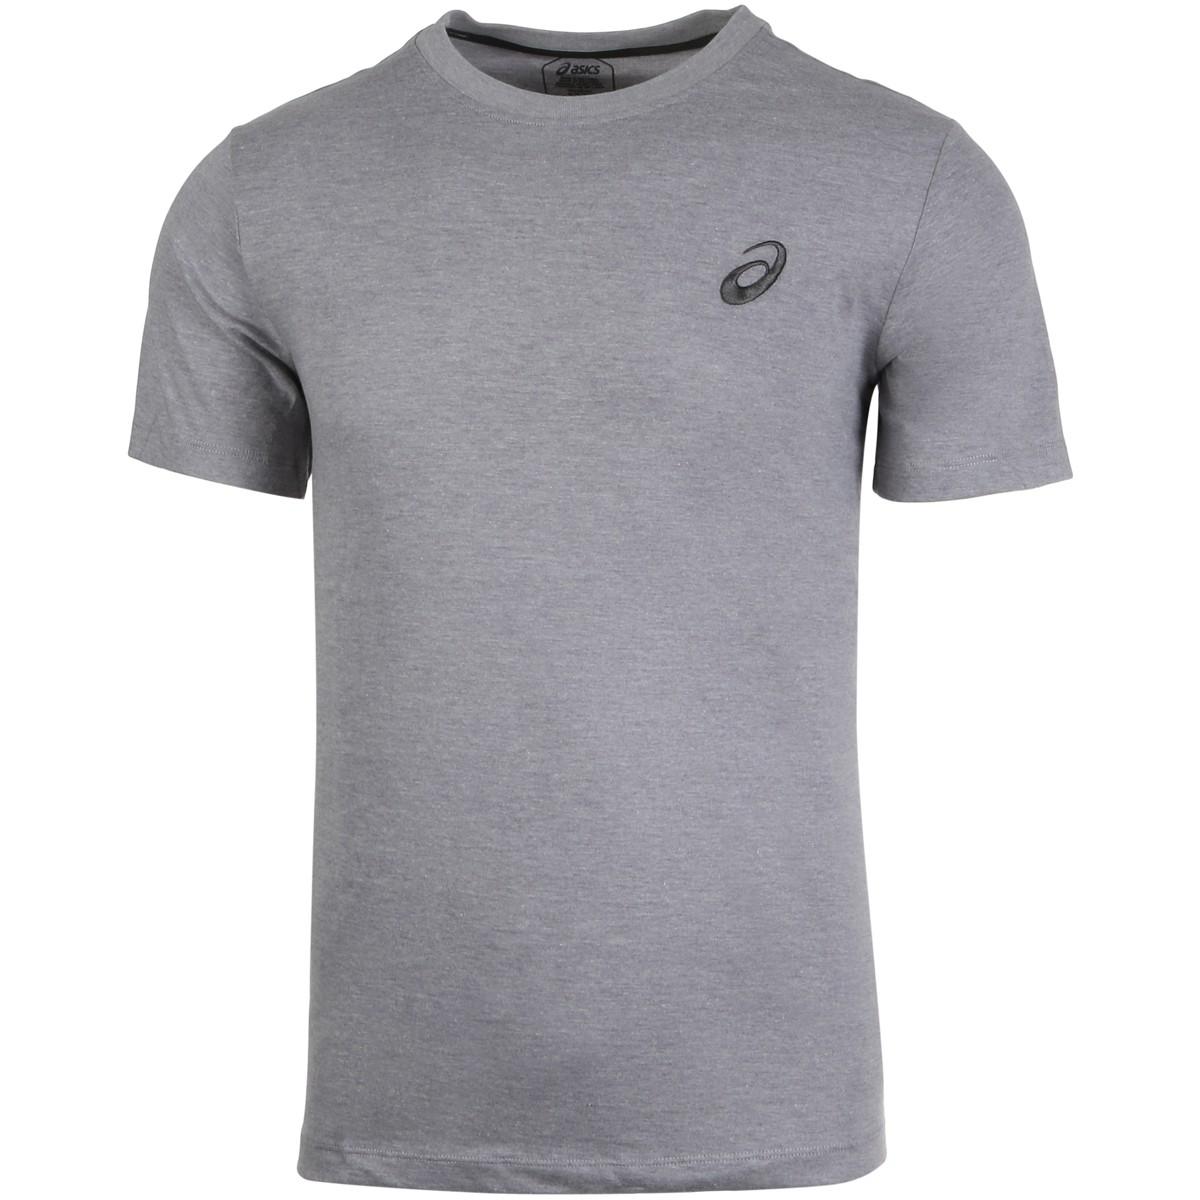 ASICS SMALL LOGO T-SHIRT - ASICS - Men's - Clothing   Tennispro